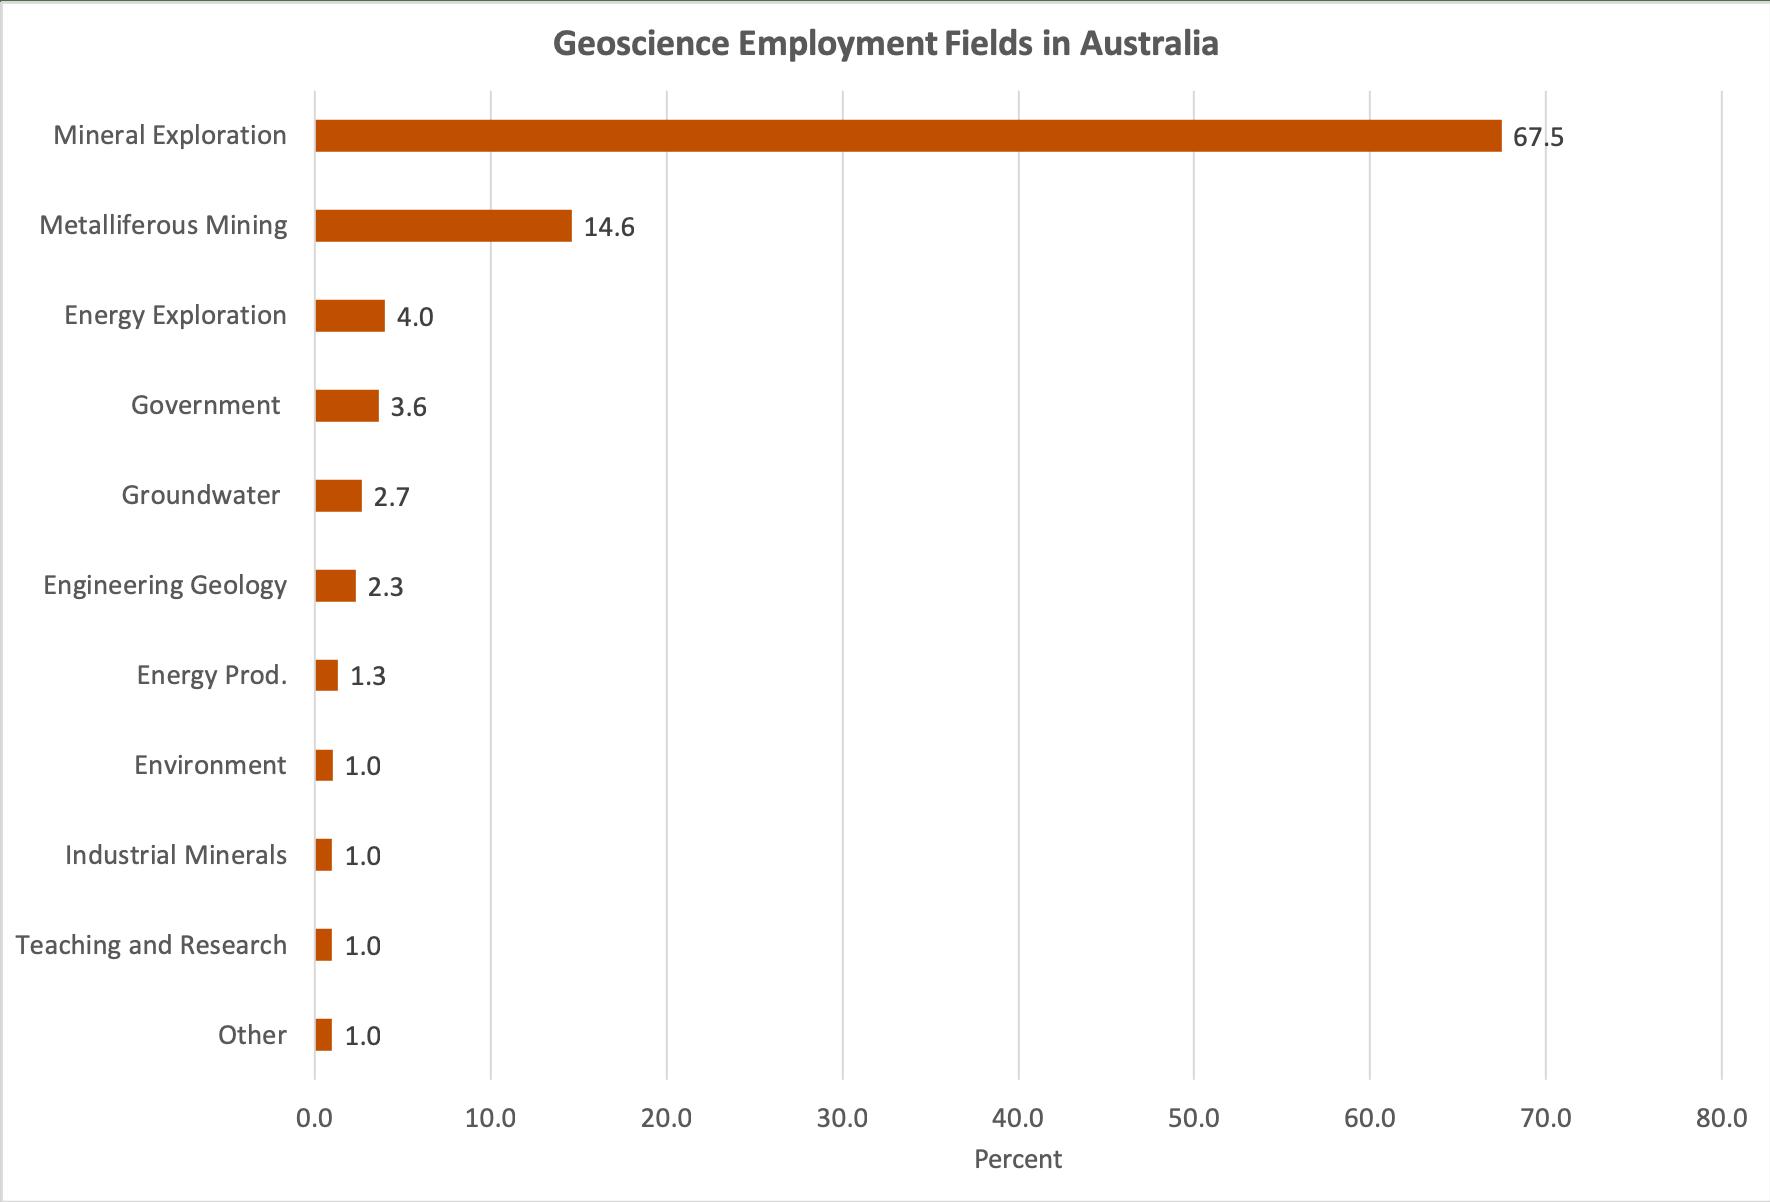 Employment fields for geoscientists in Australia